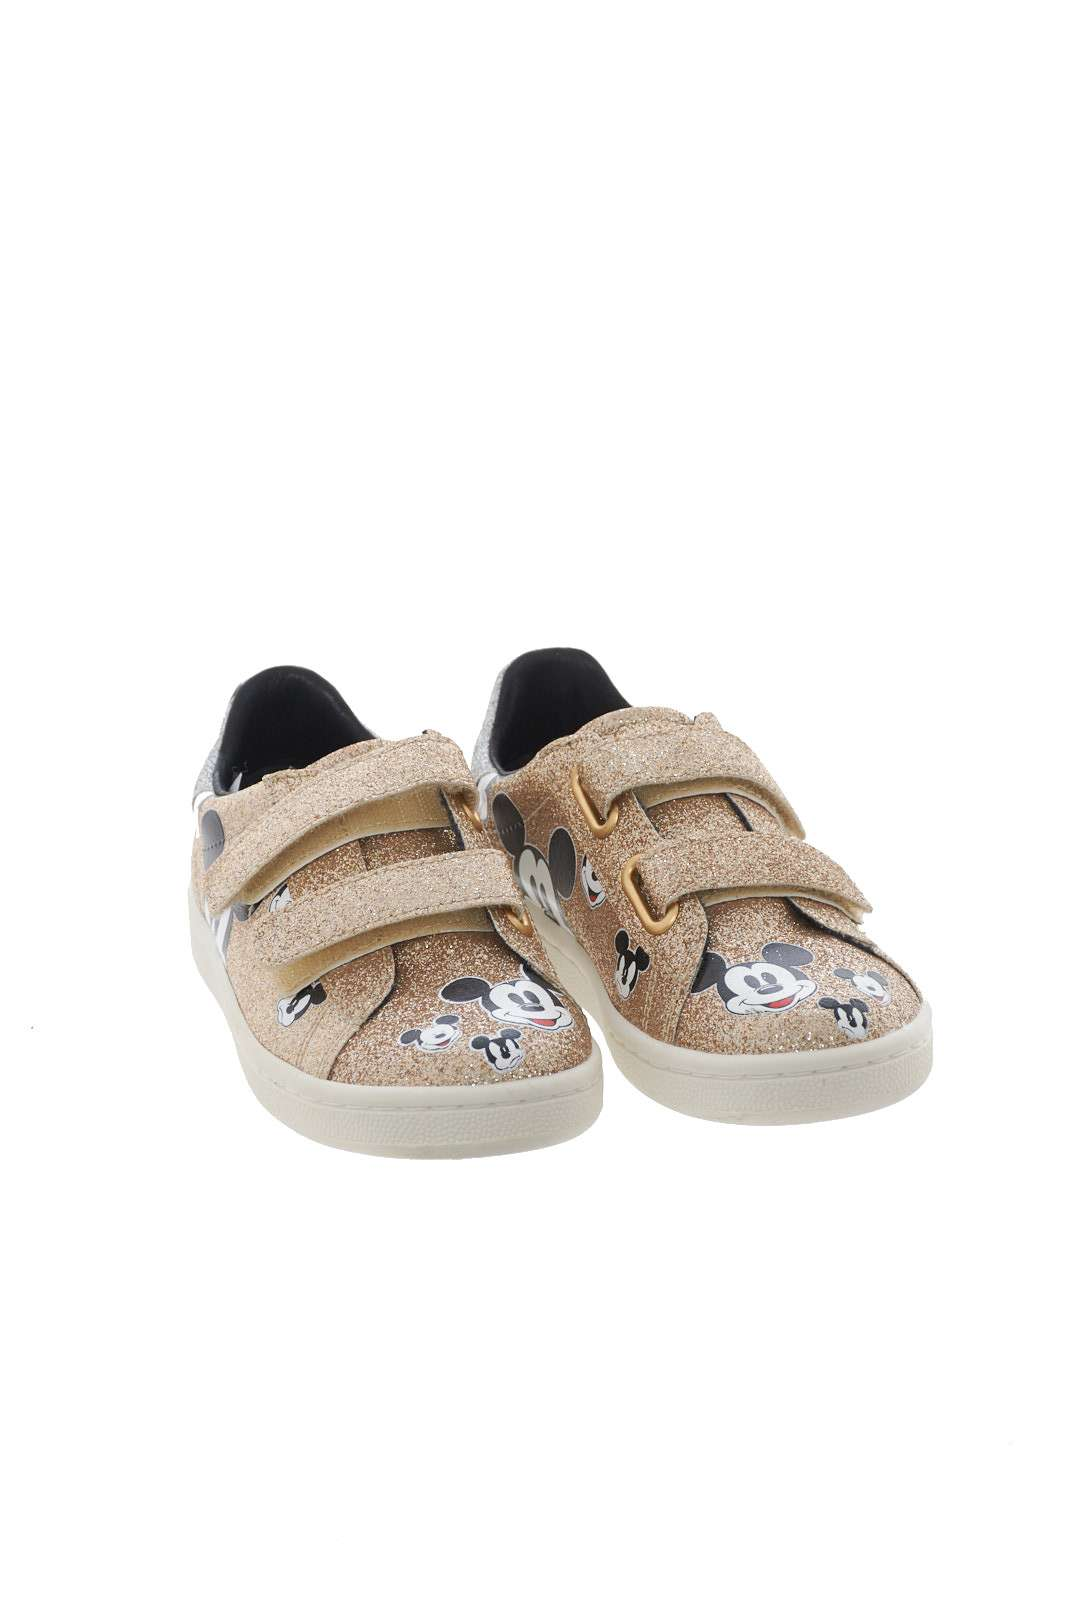 https://www.parmax.com/media/catalog/product/A/I/AI-outlet_parmax-scarpe-bambina-MoaConcept-MDJ269-B.jpg